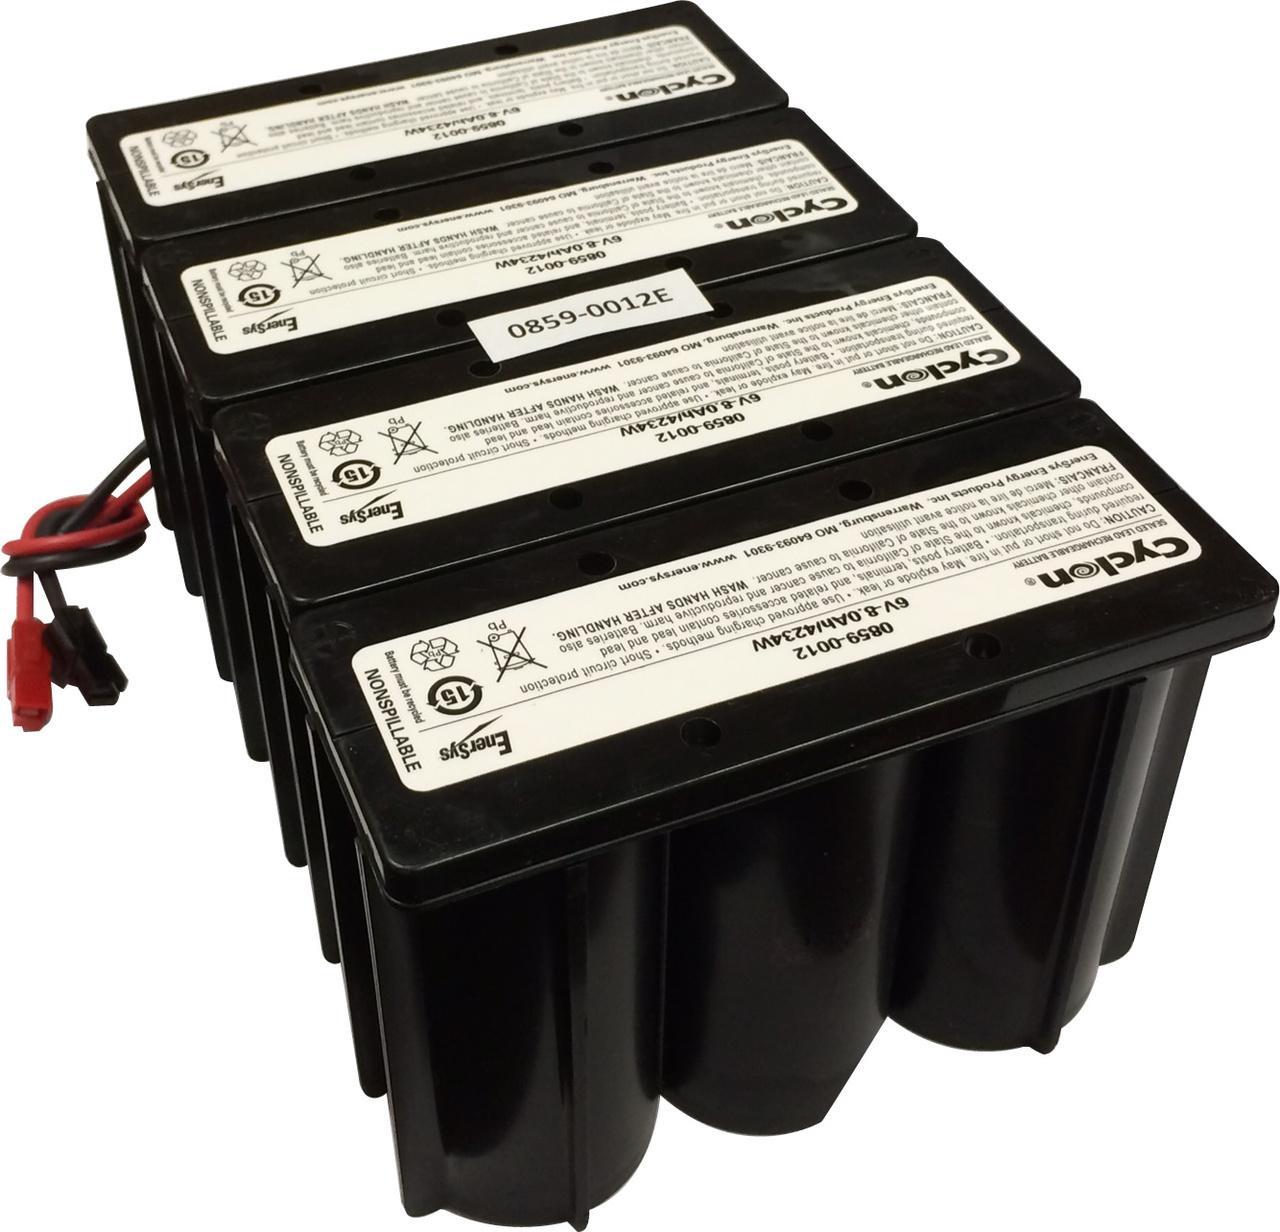 Cyclon卷绕电池 霍克电池 Enersys电池 6V全系列 3